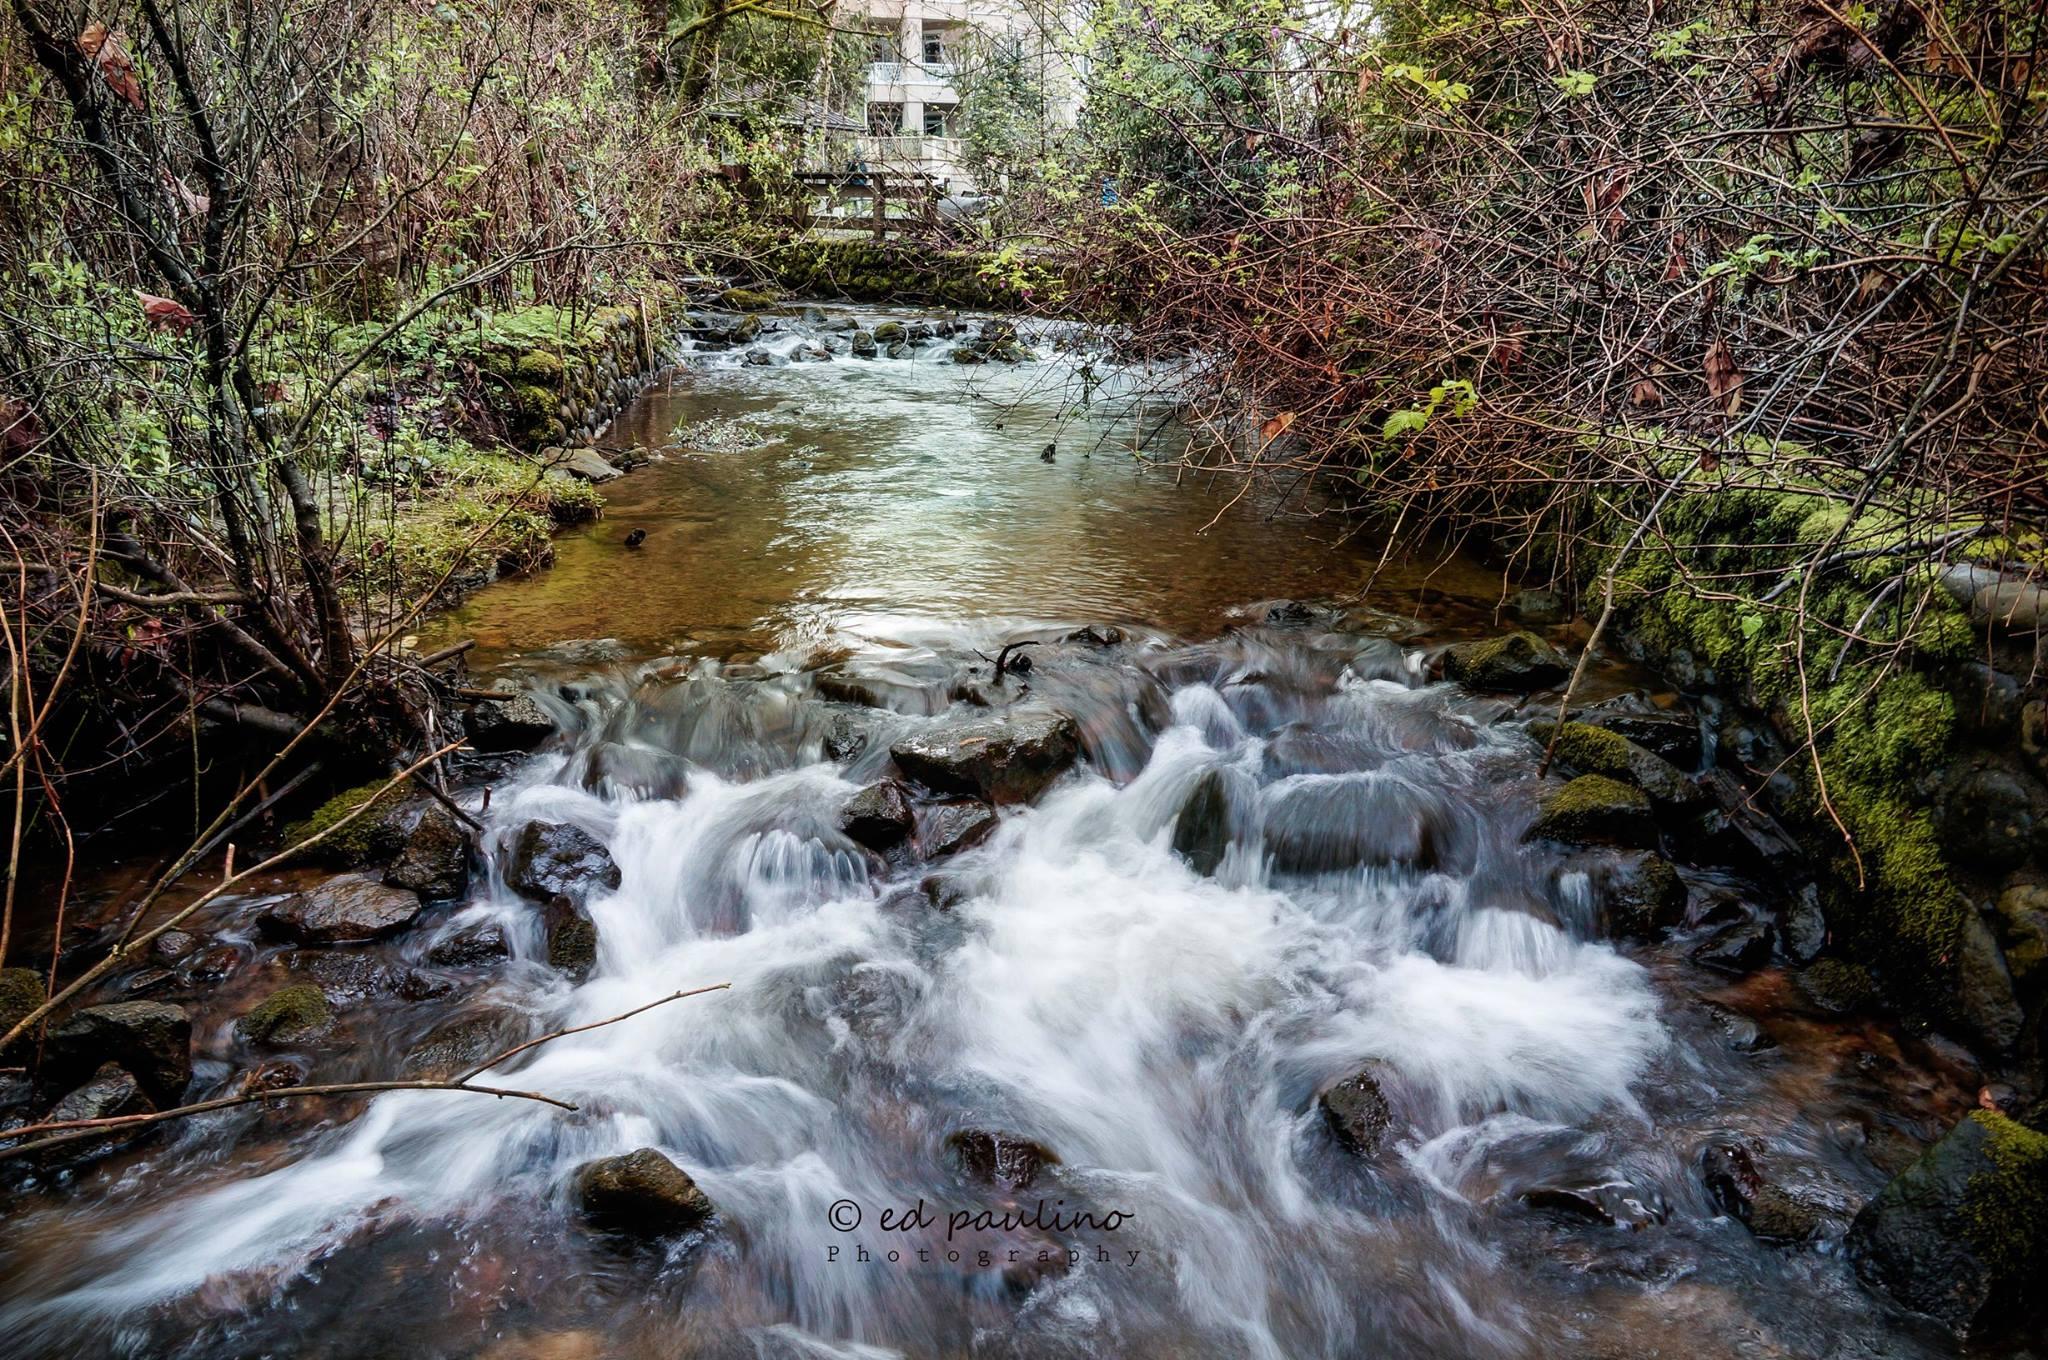 Hoy Creek, Coquitlam , close to the hatchery... (Photo: Ed Paulino)